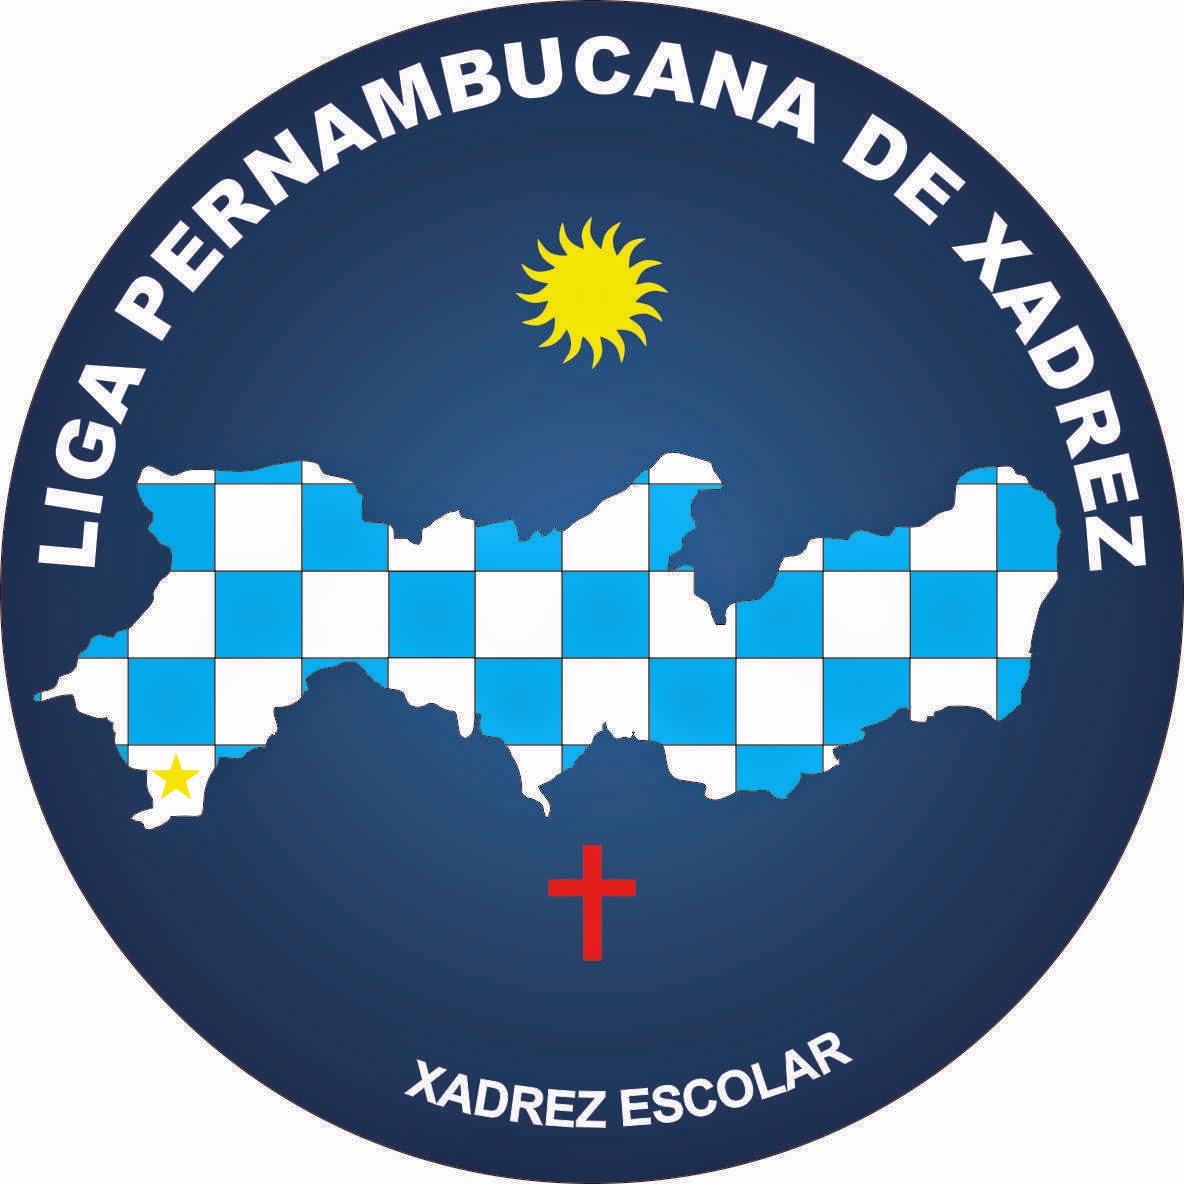 Liga Pernambucana de Xadrez